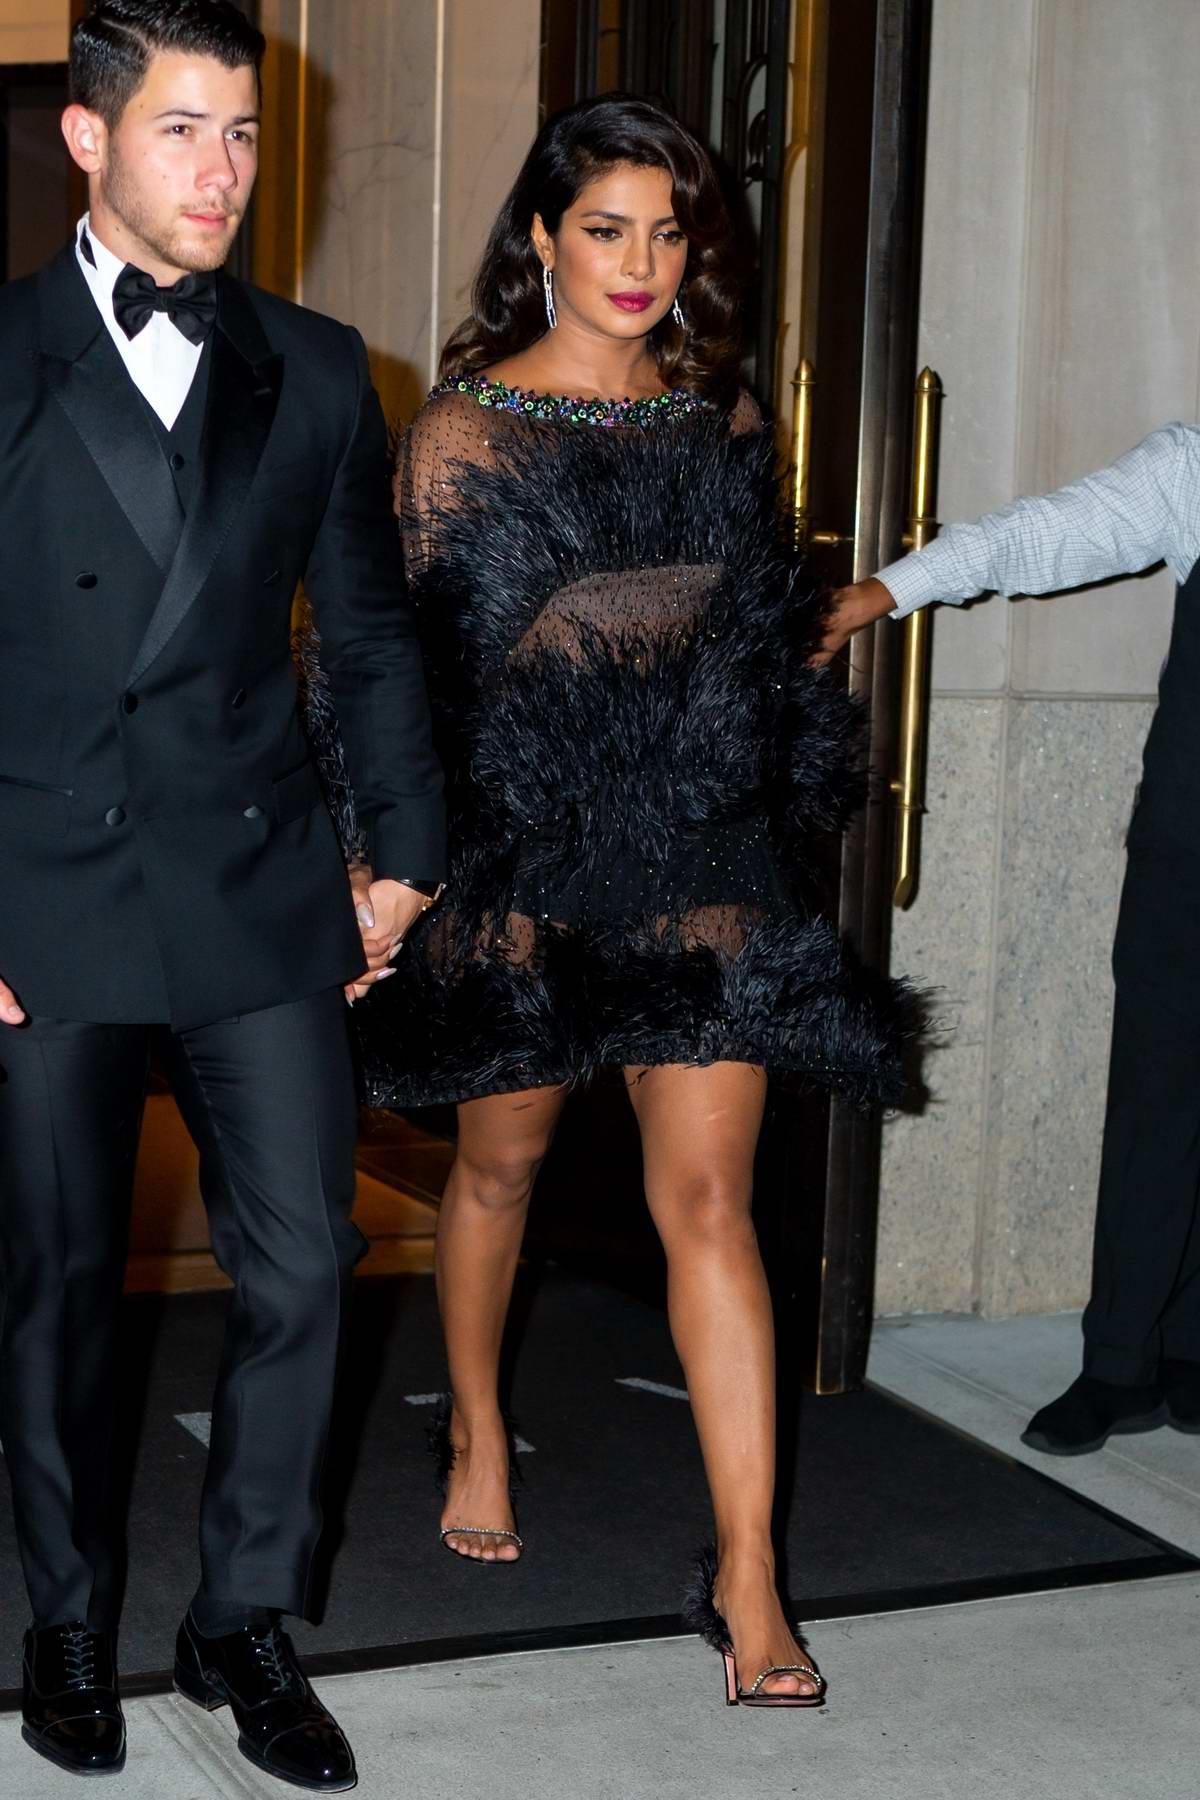 Priyanka Chopra wears a black sheer dress while arriving at Cipriani Wall Street with Nick Jonas in New York City